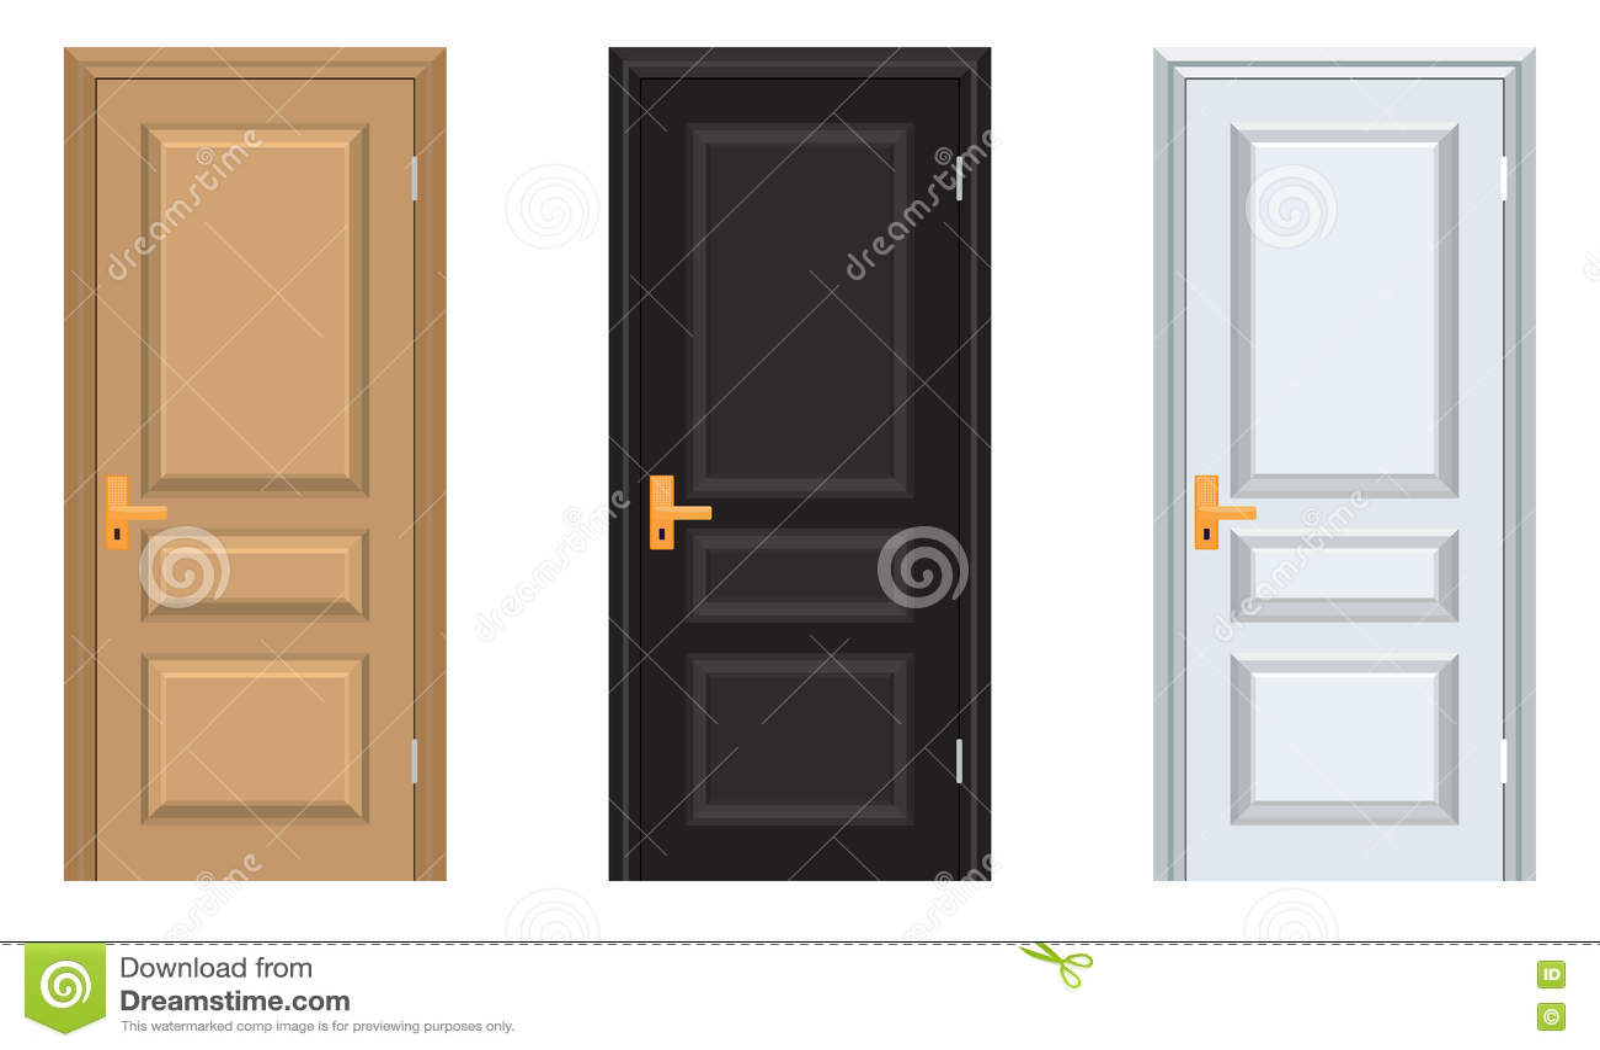 Schwarze Türen vektor-bunte geschlossene tür mit feld weiße schwarze braune türen